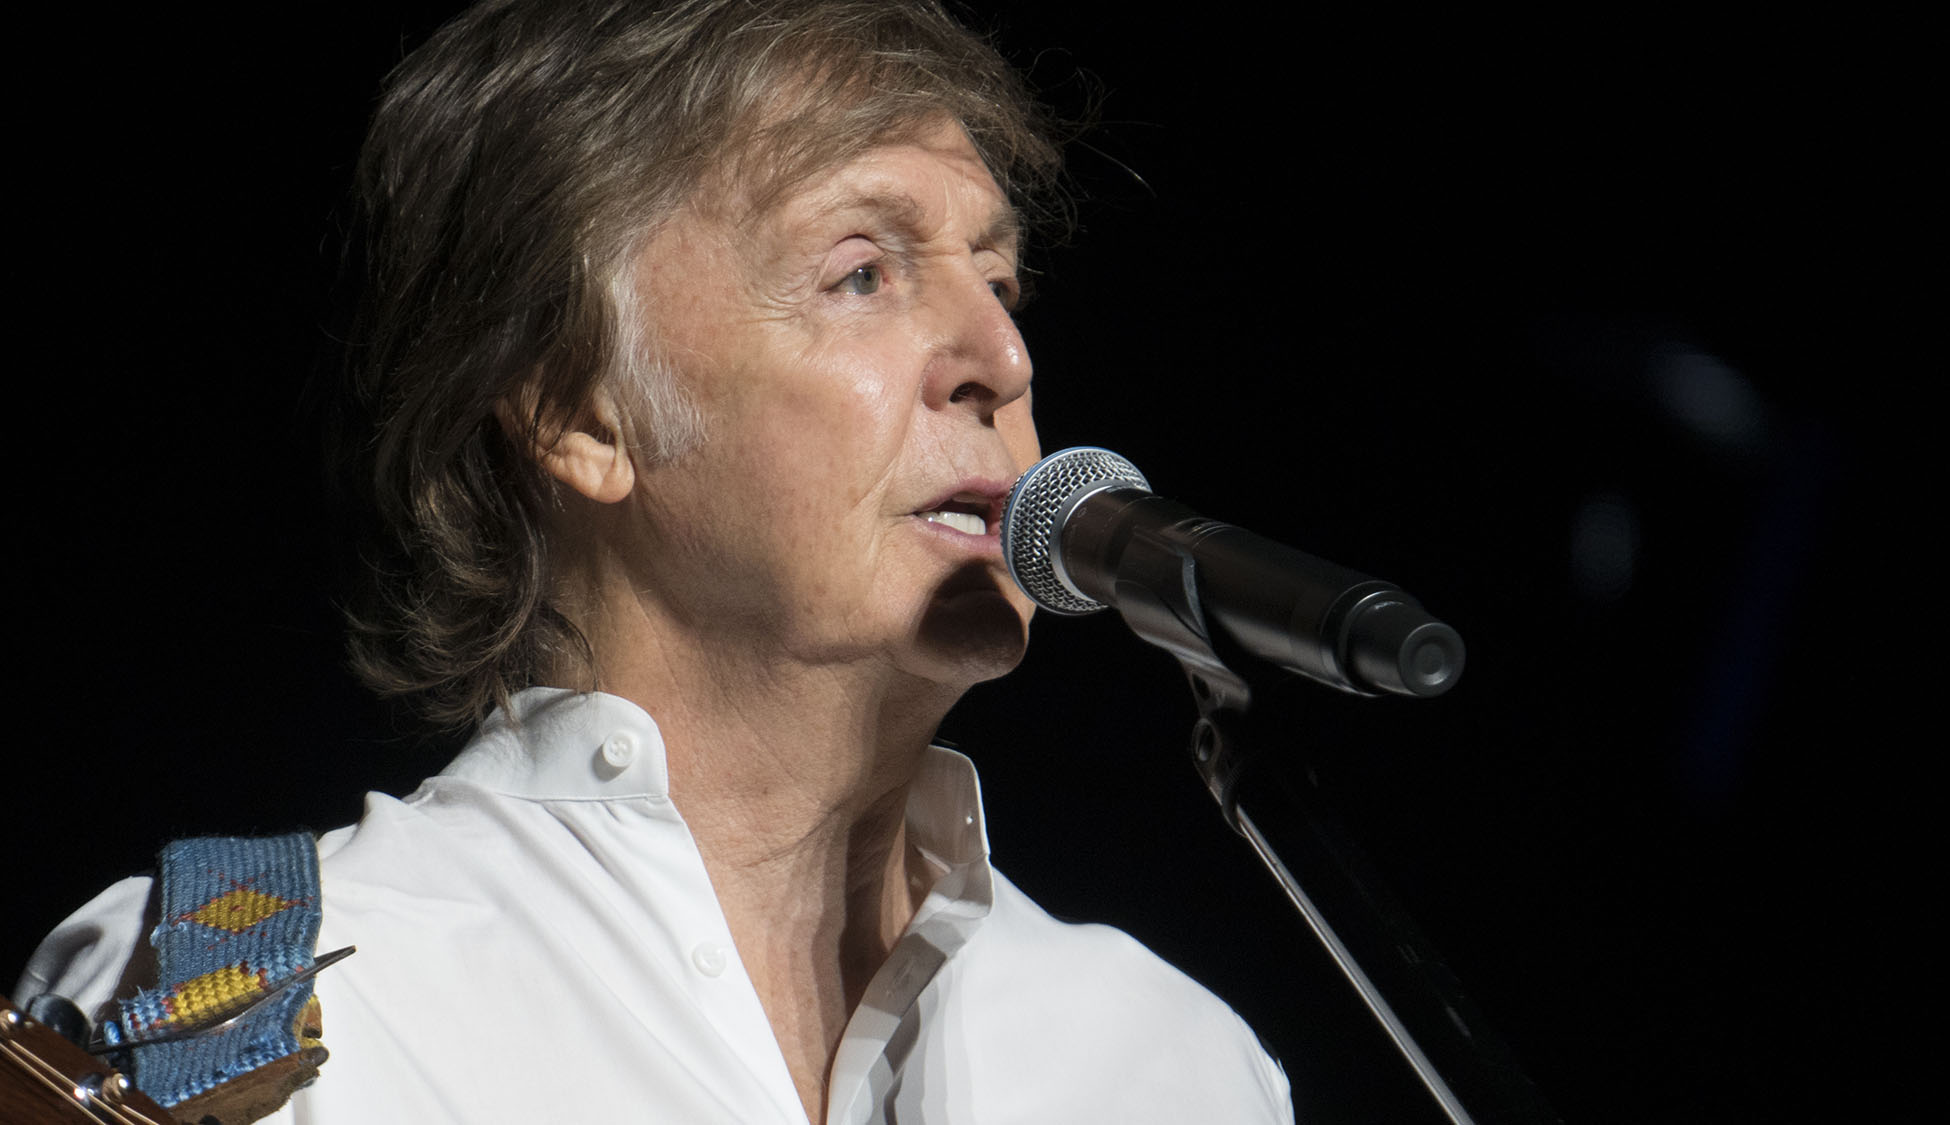 Paul McCartney at the Barclays Center, Brooklyn, NY 9-19-17